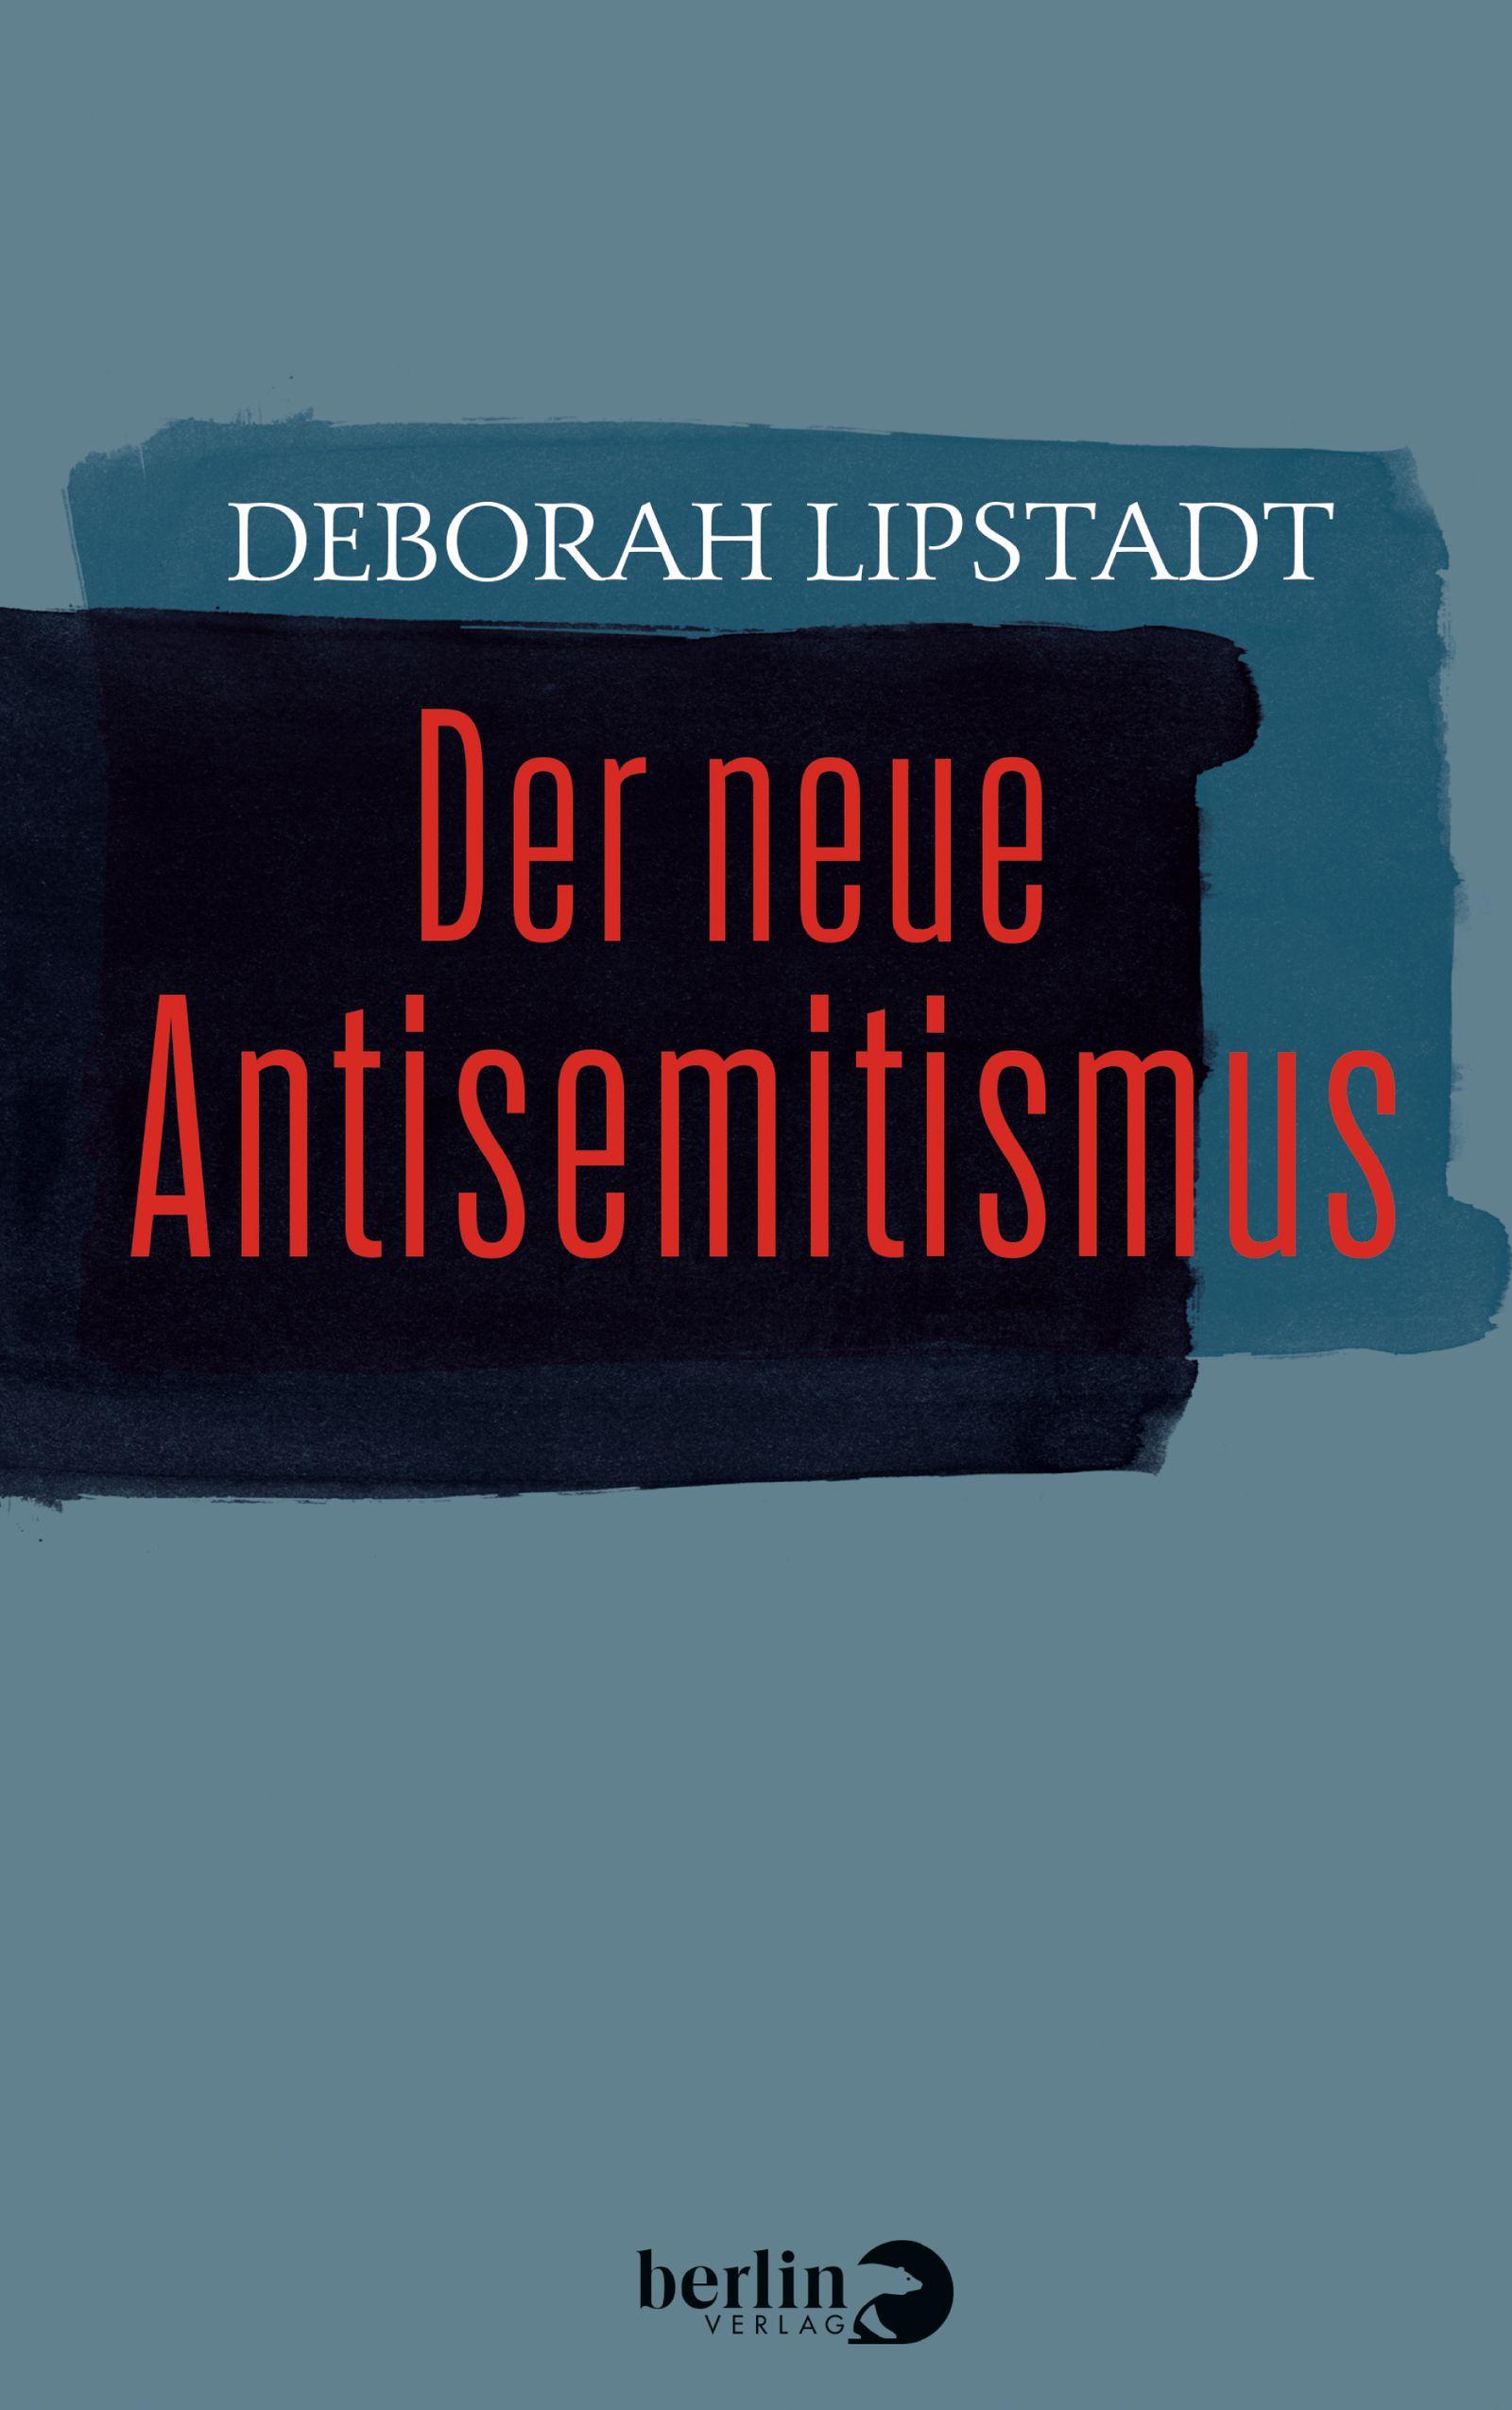 Buchcover Deborah Lipstadt: Der neue Antisemitismus